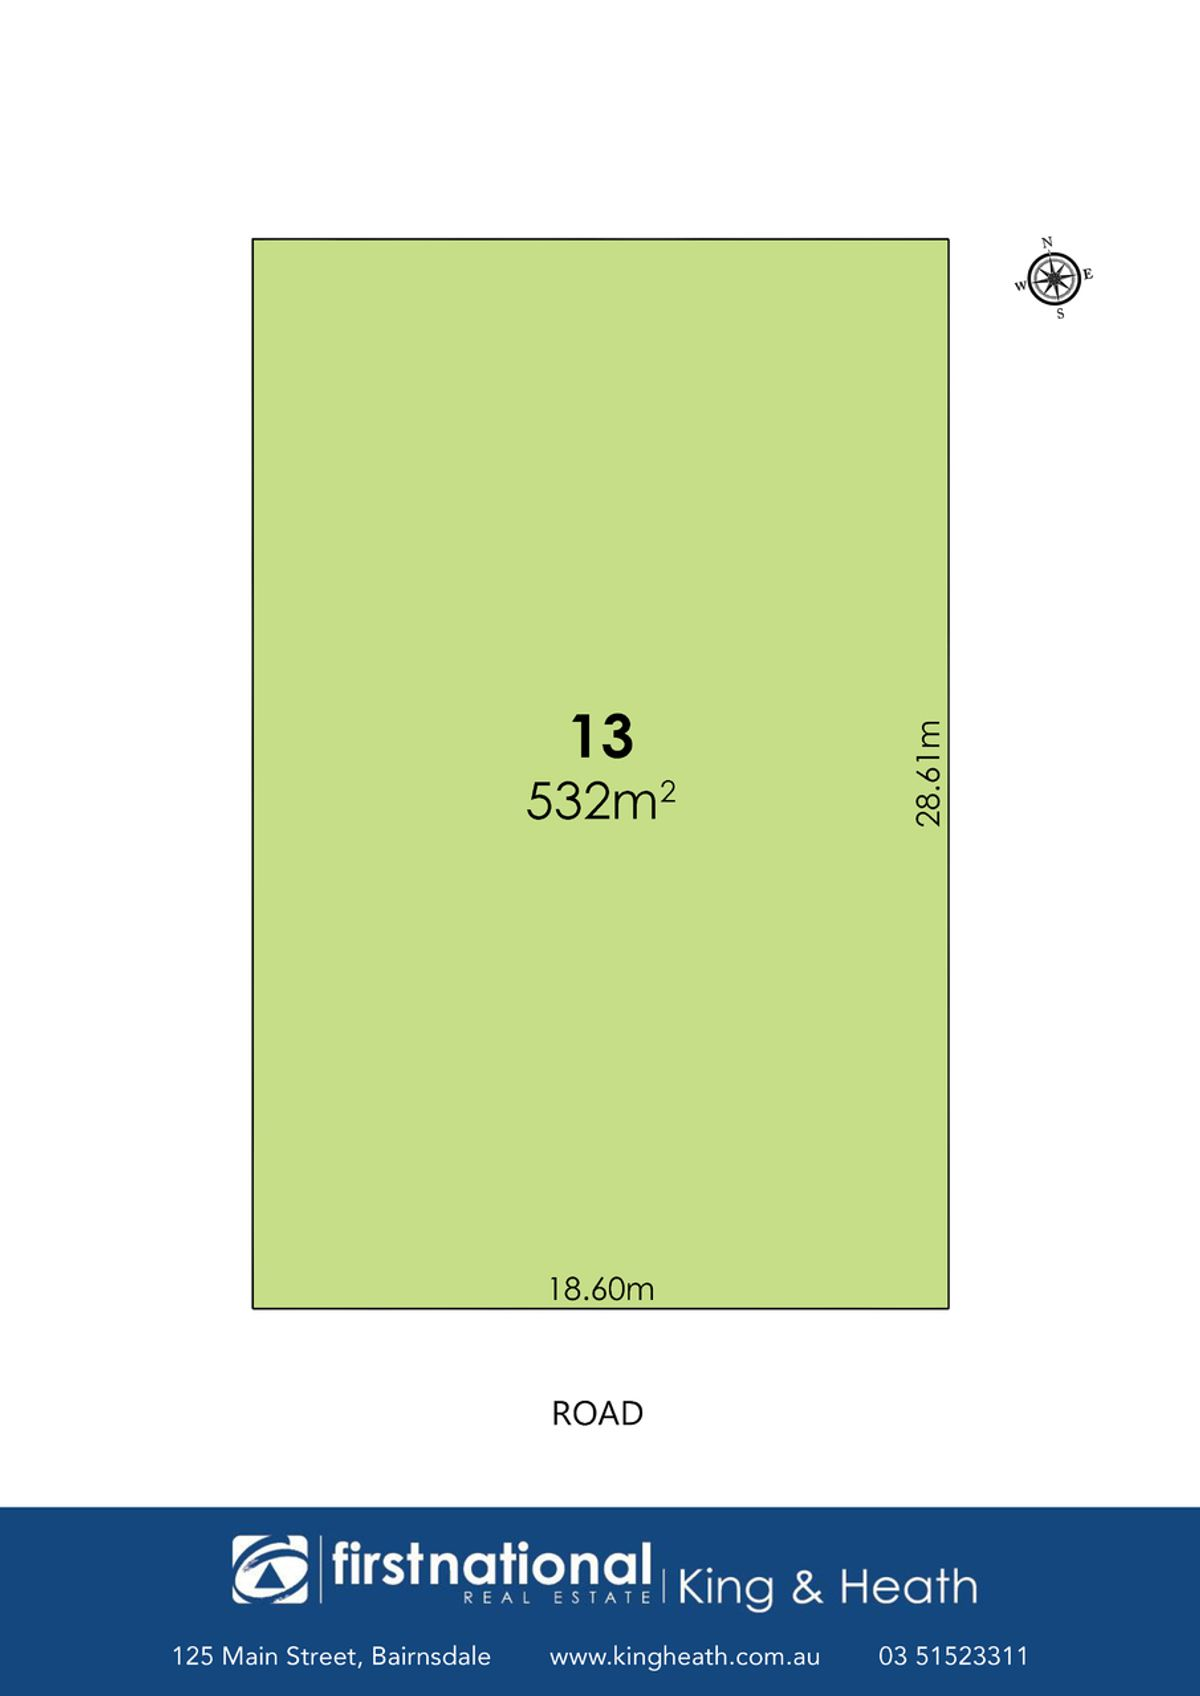 Lt 13, 103 Crooke Street, East Bairnsdale, VIC 3875